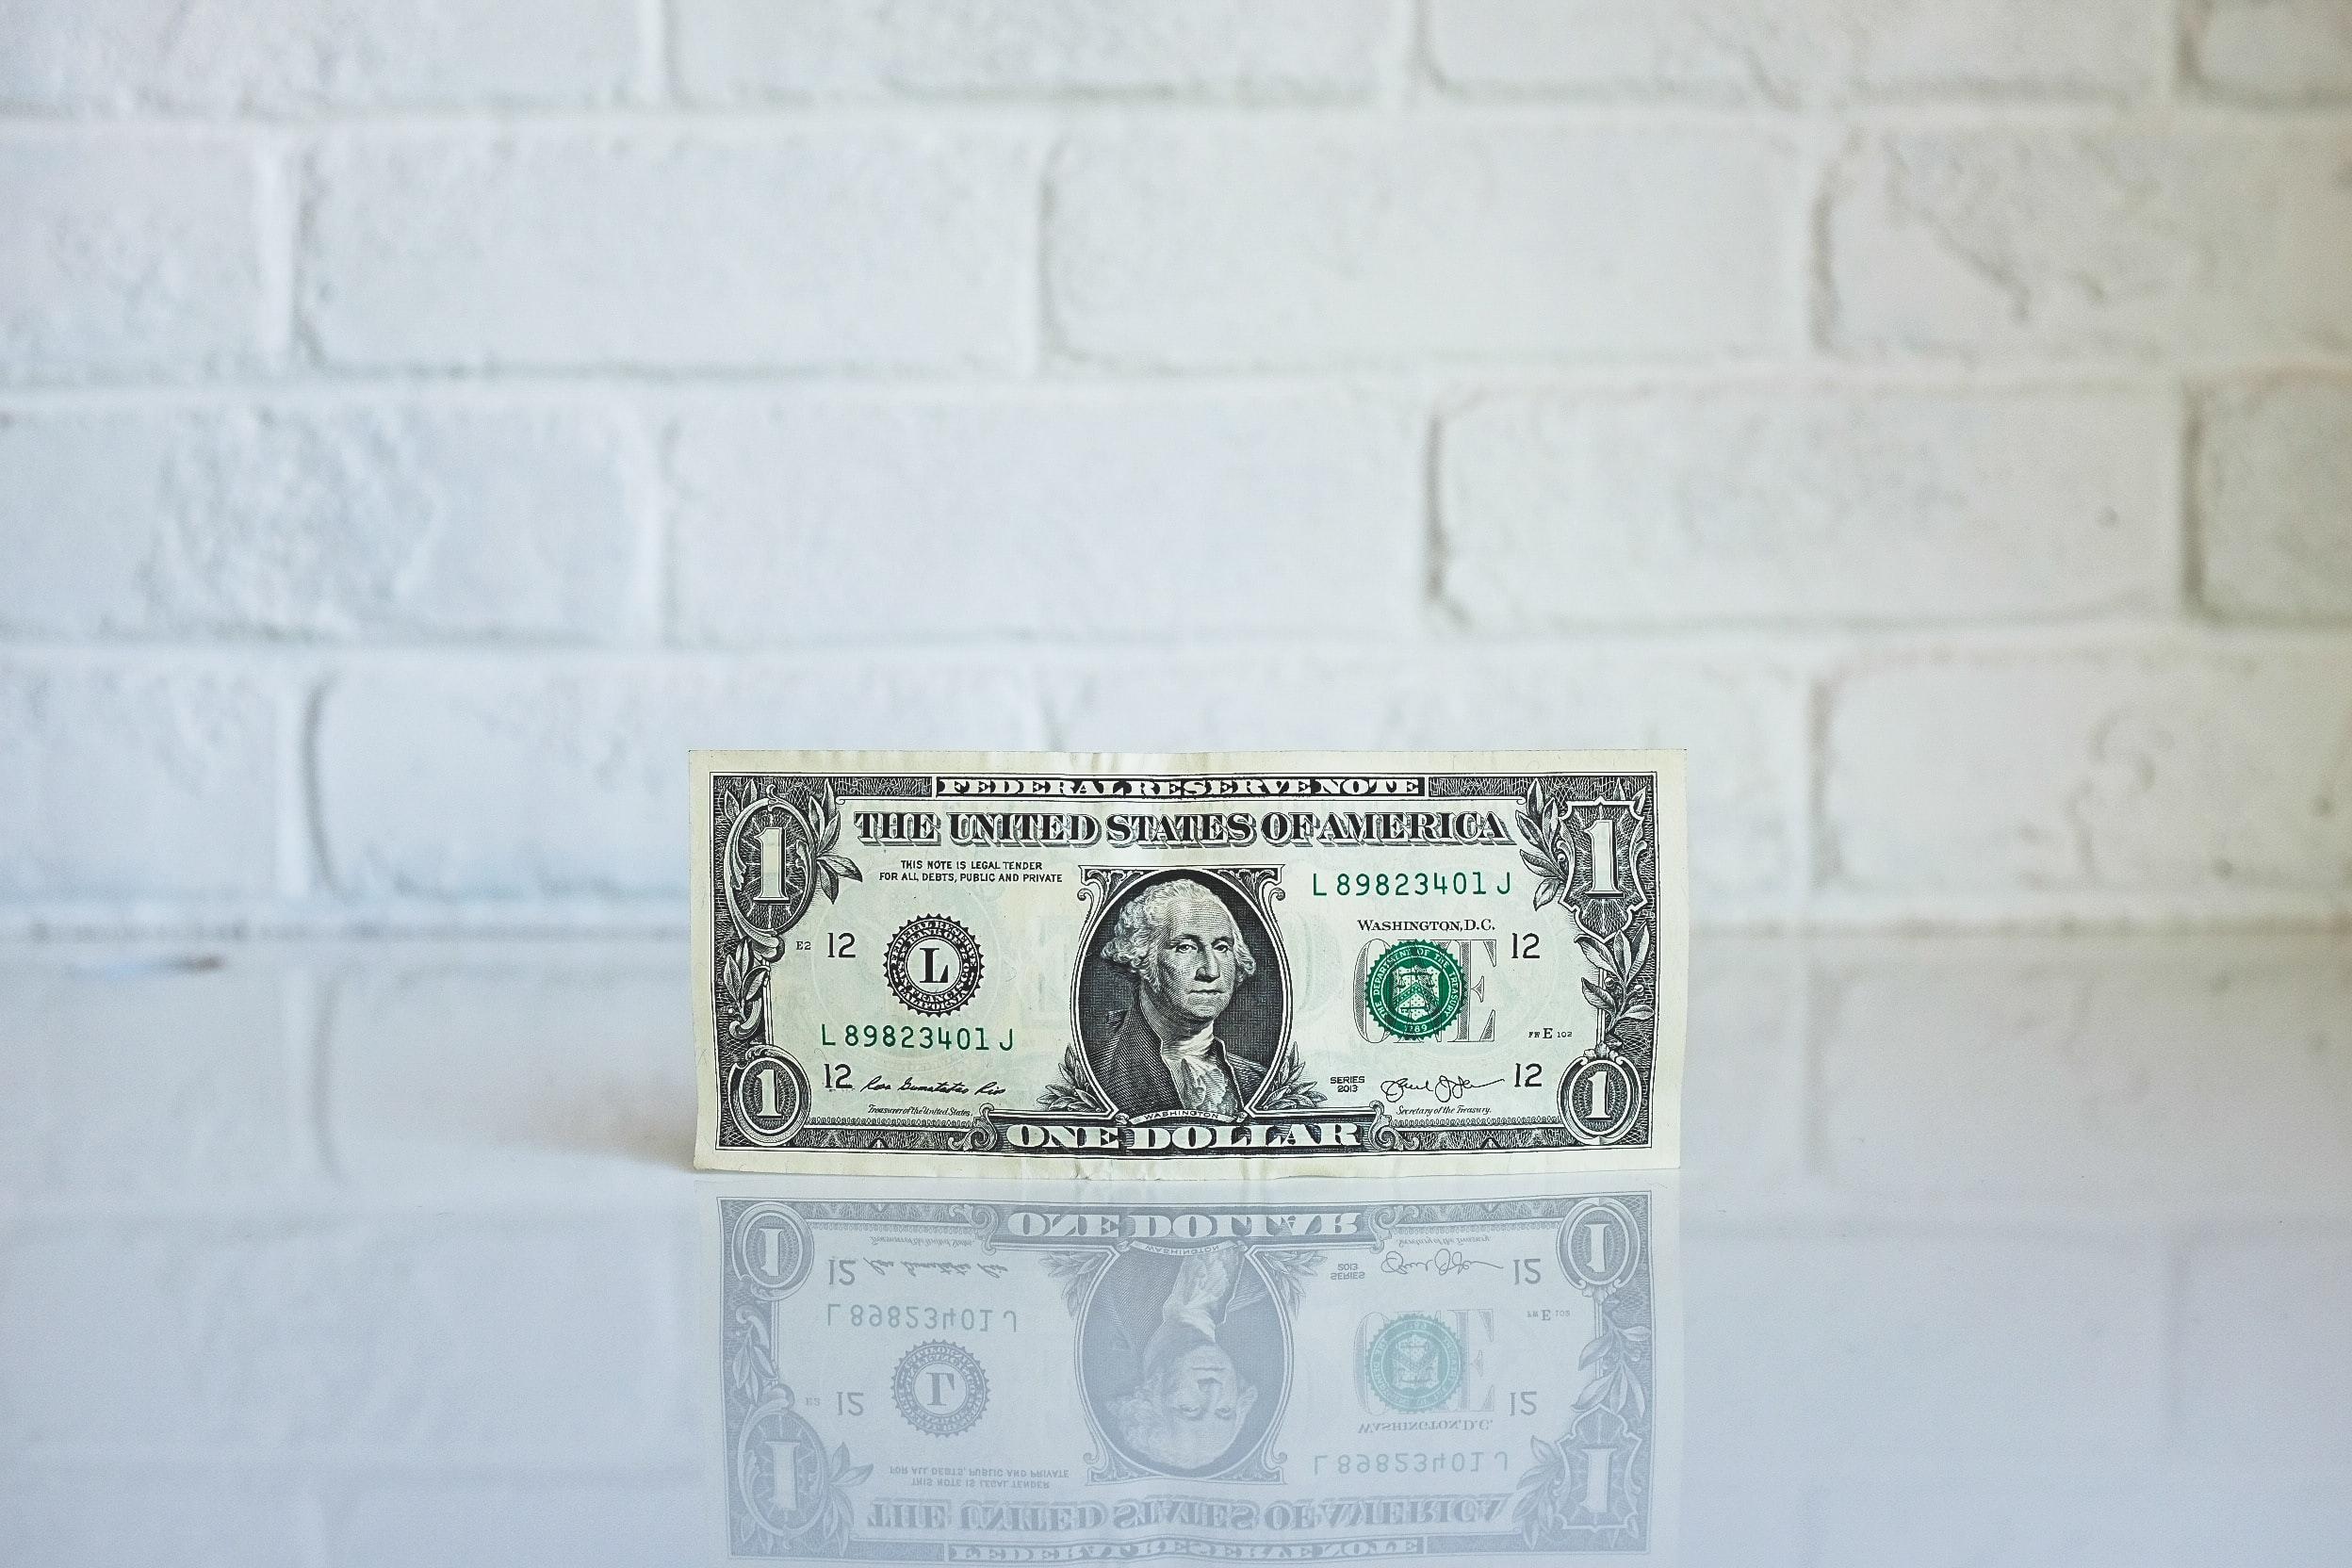 Image of a U.S. dollar bill